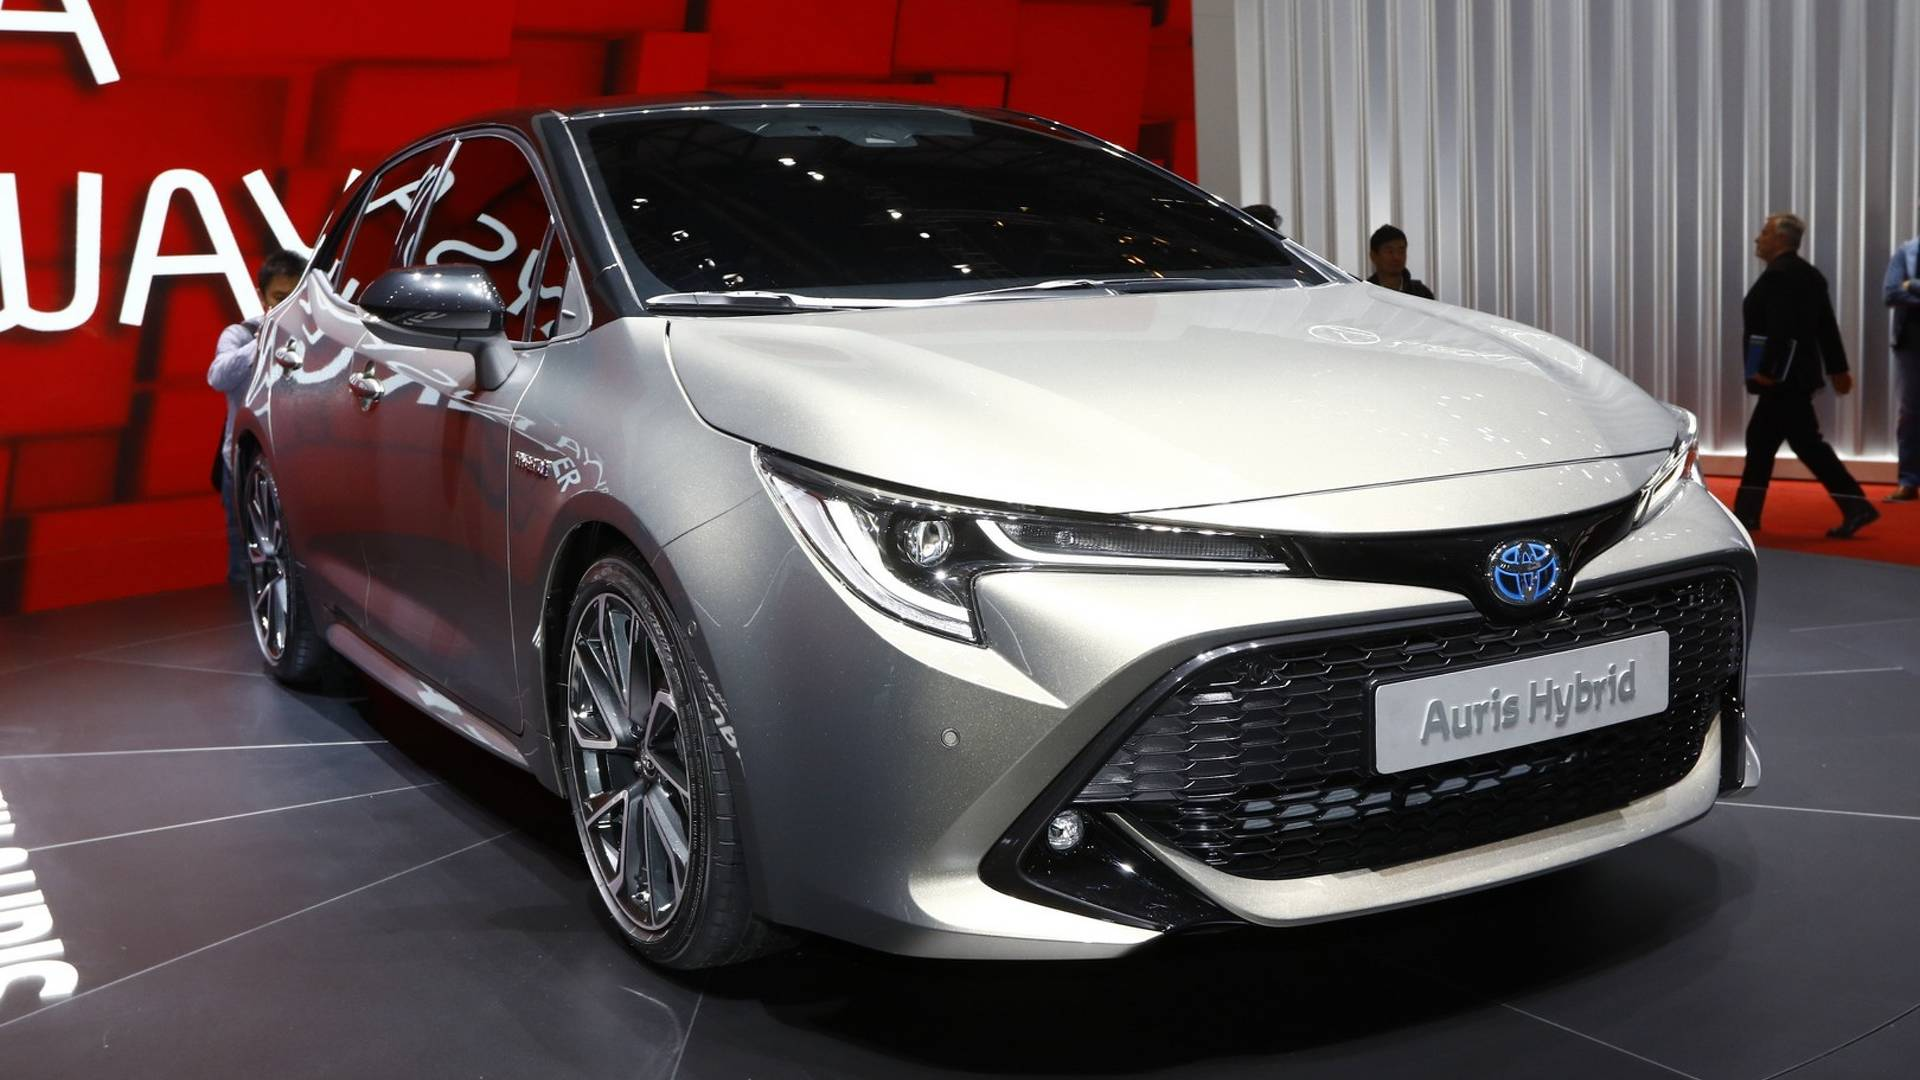 Next Generation Toyota Auris Debuts in Geneva 3